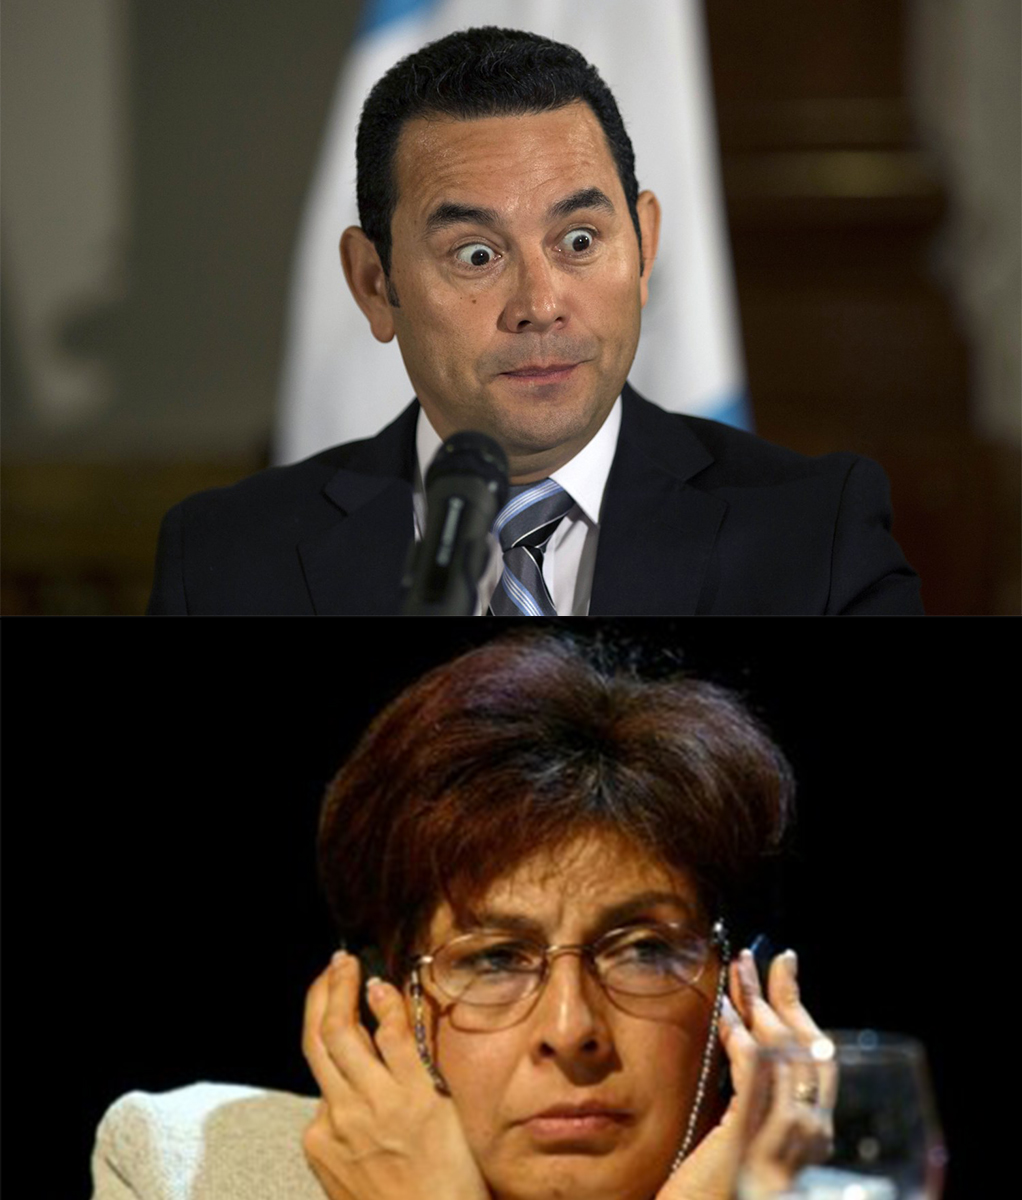 Foto: diarioelinformal.info y lanoticiaenguatemala.com